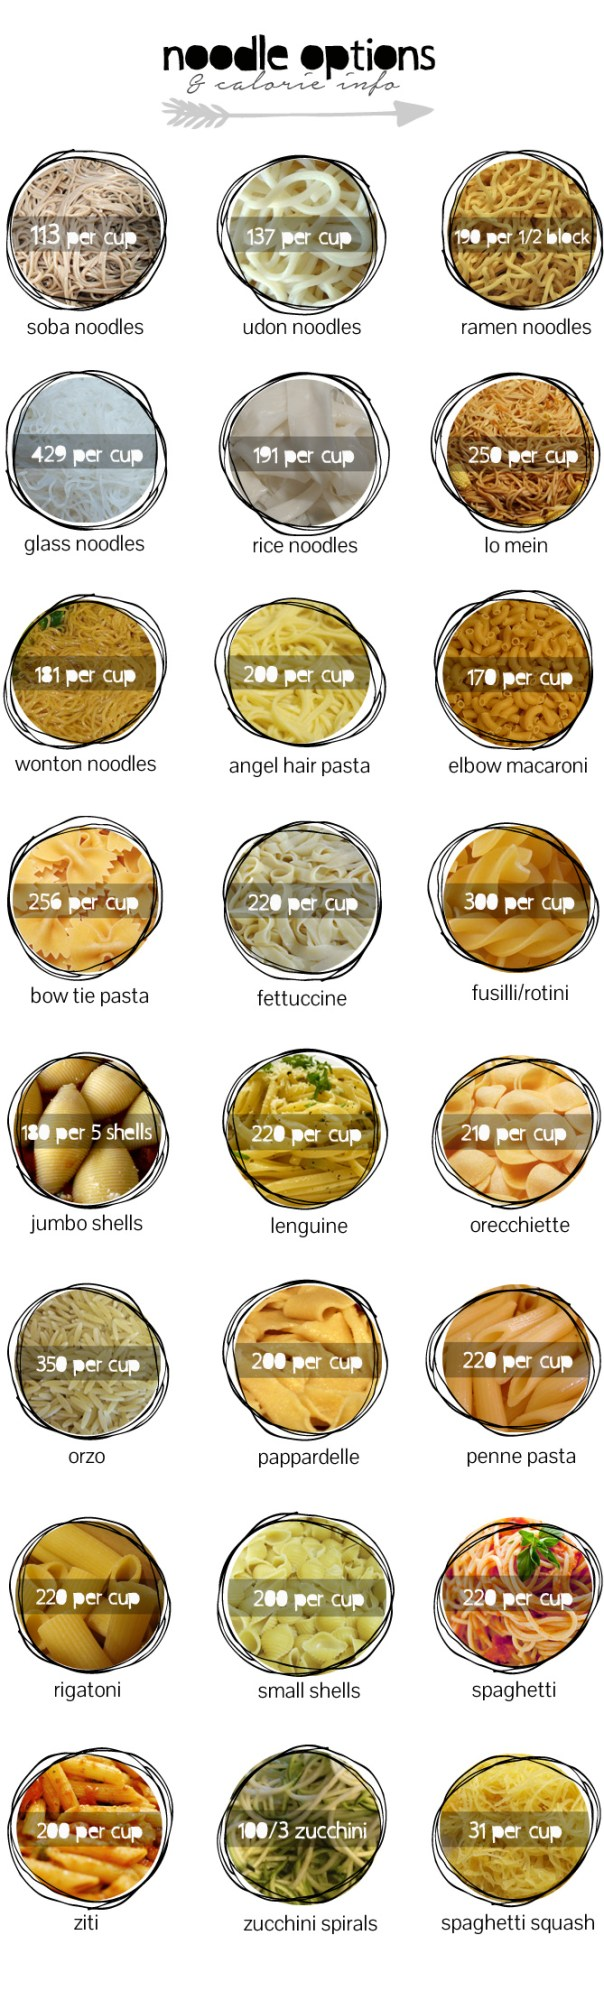 24 pasta options #midwestlovefest